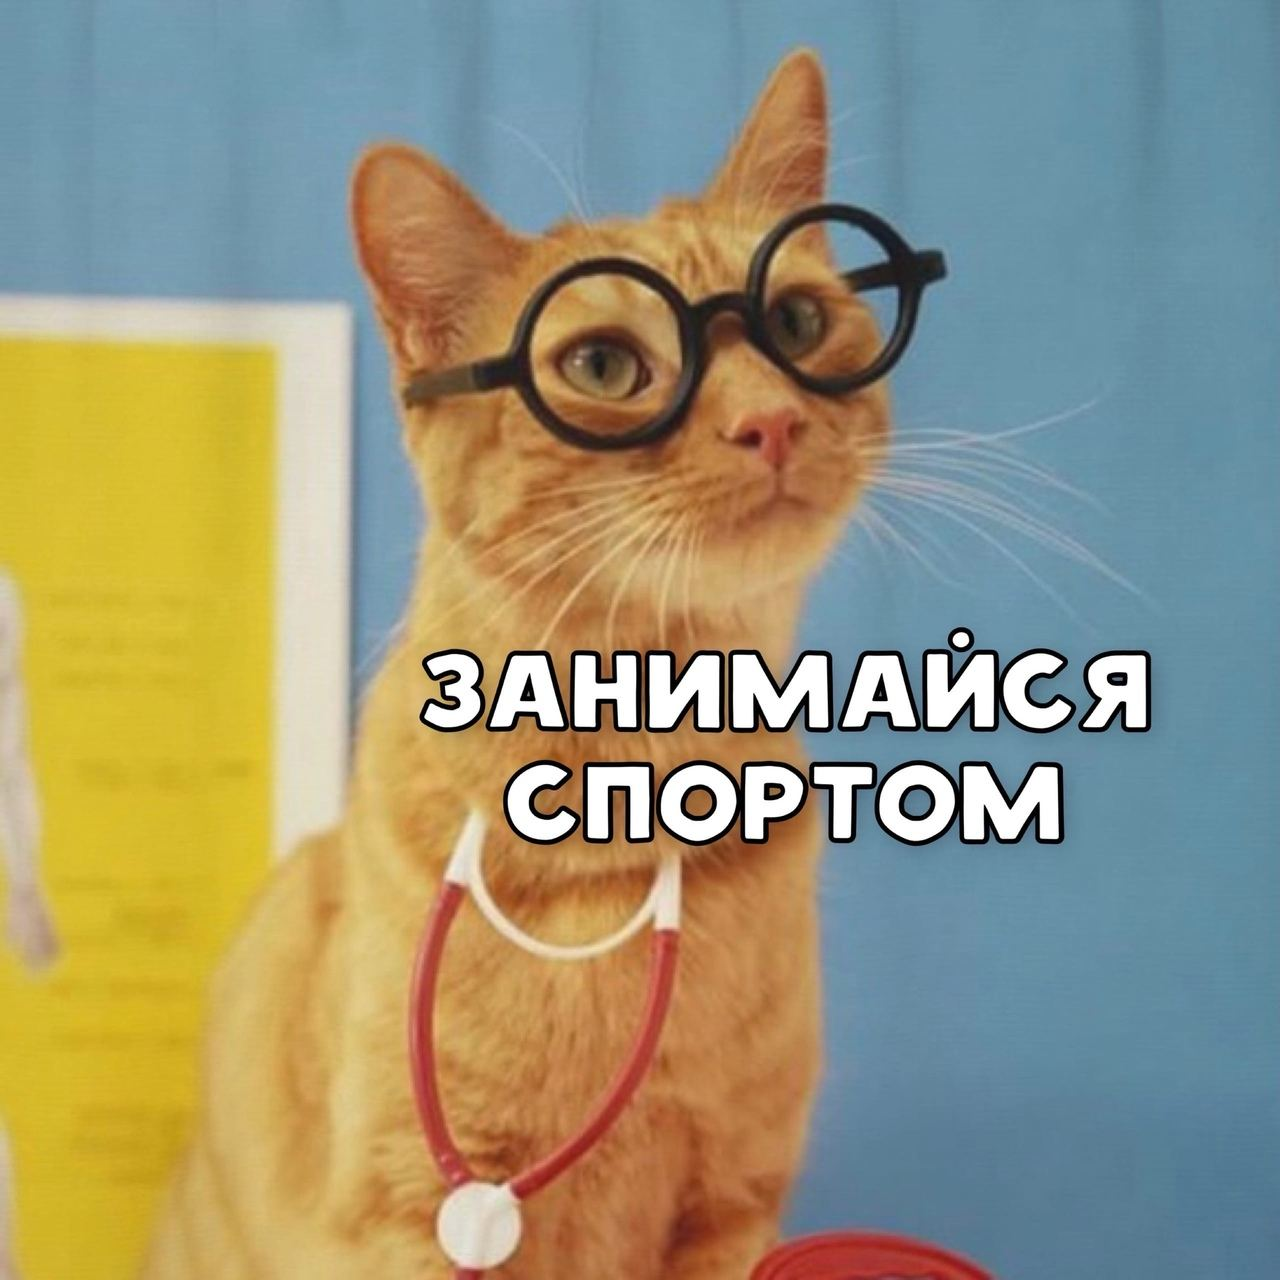 IMG_20210818_192631_283.jpg